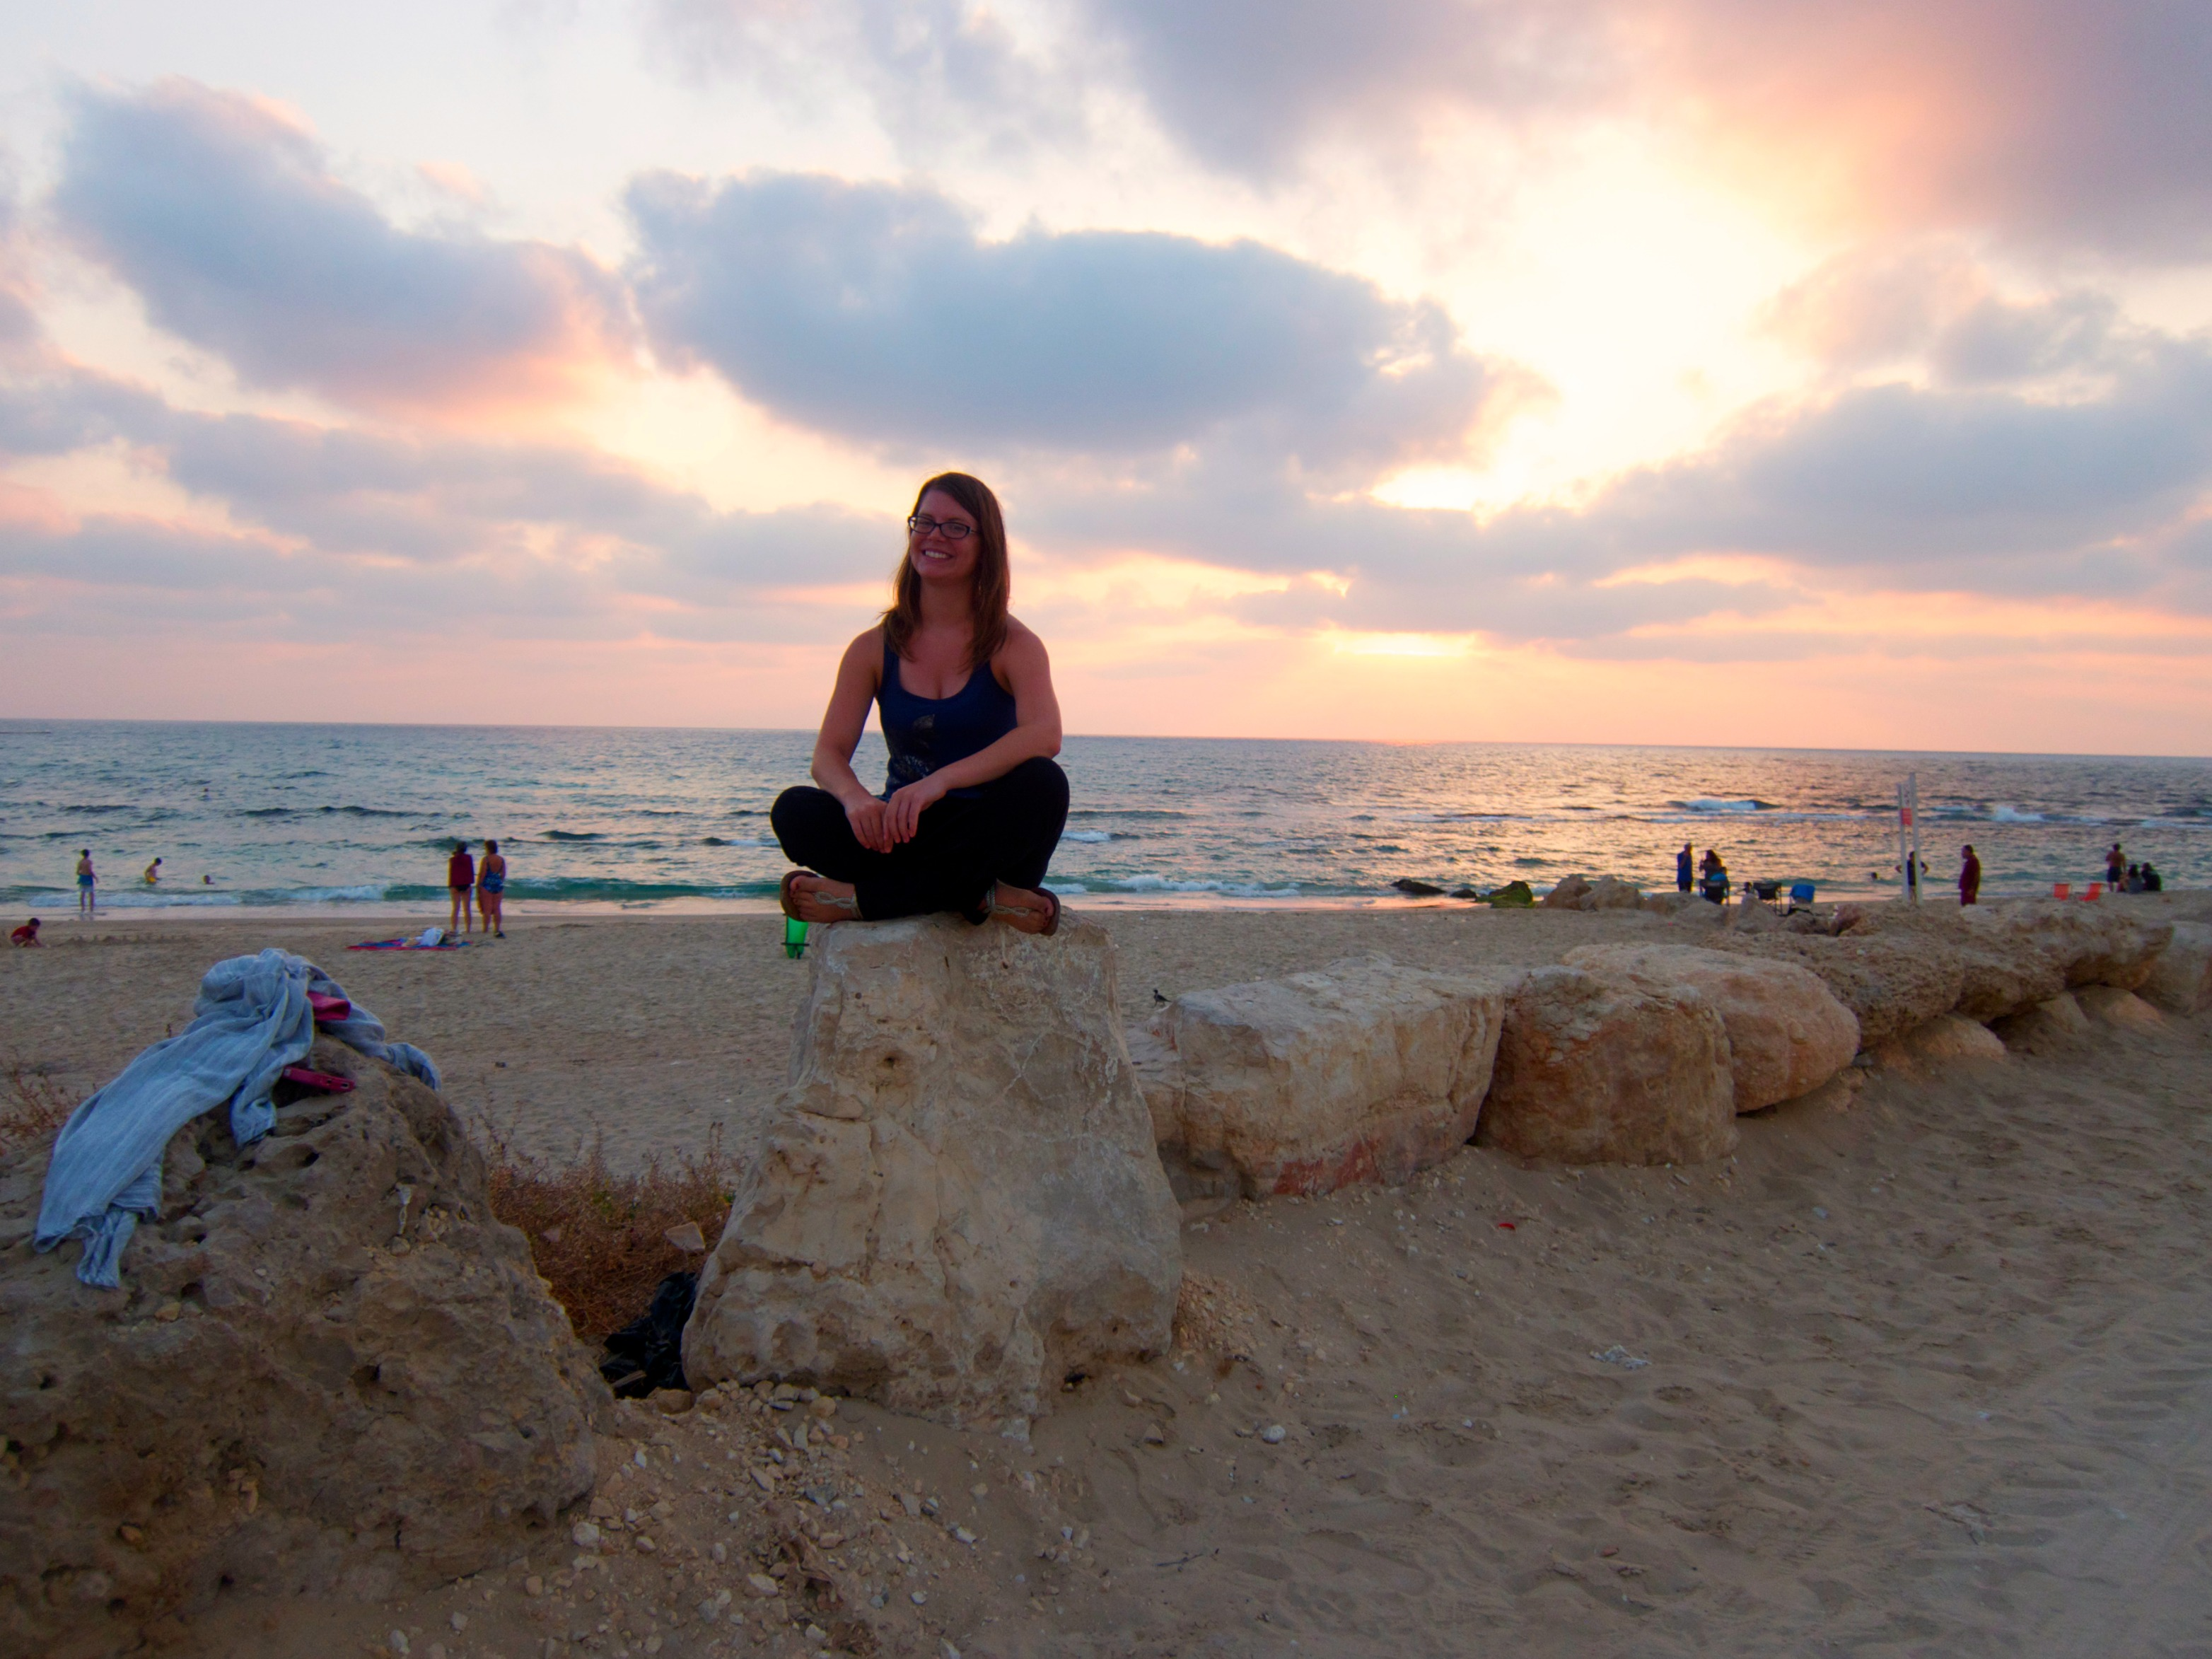 Israel_Aquaduct1